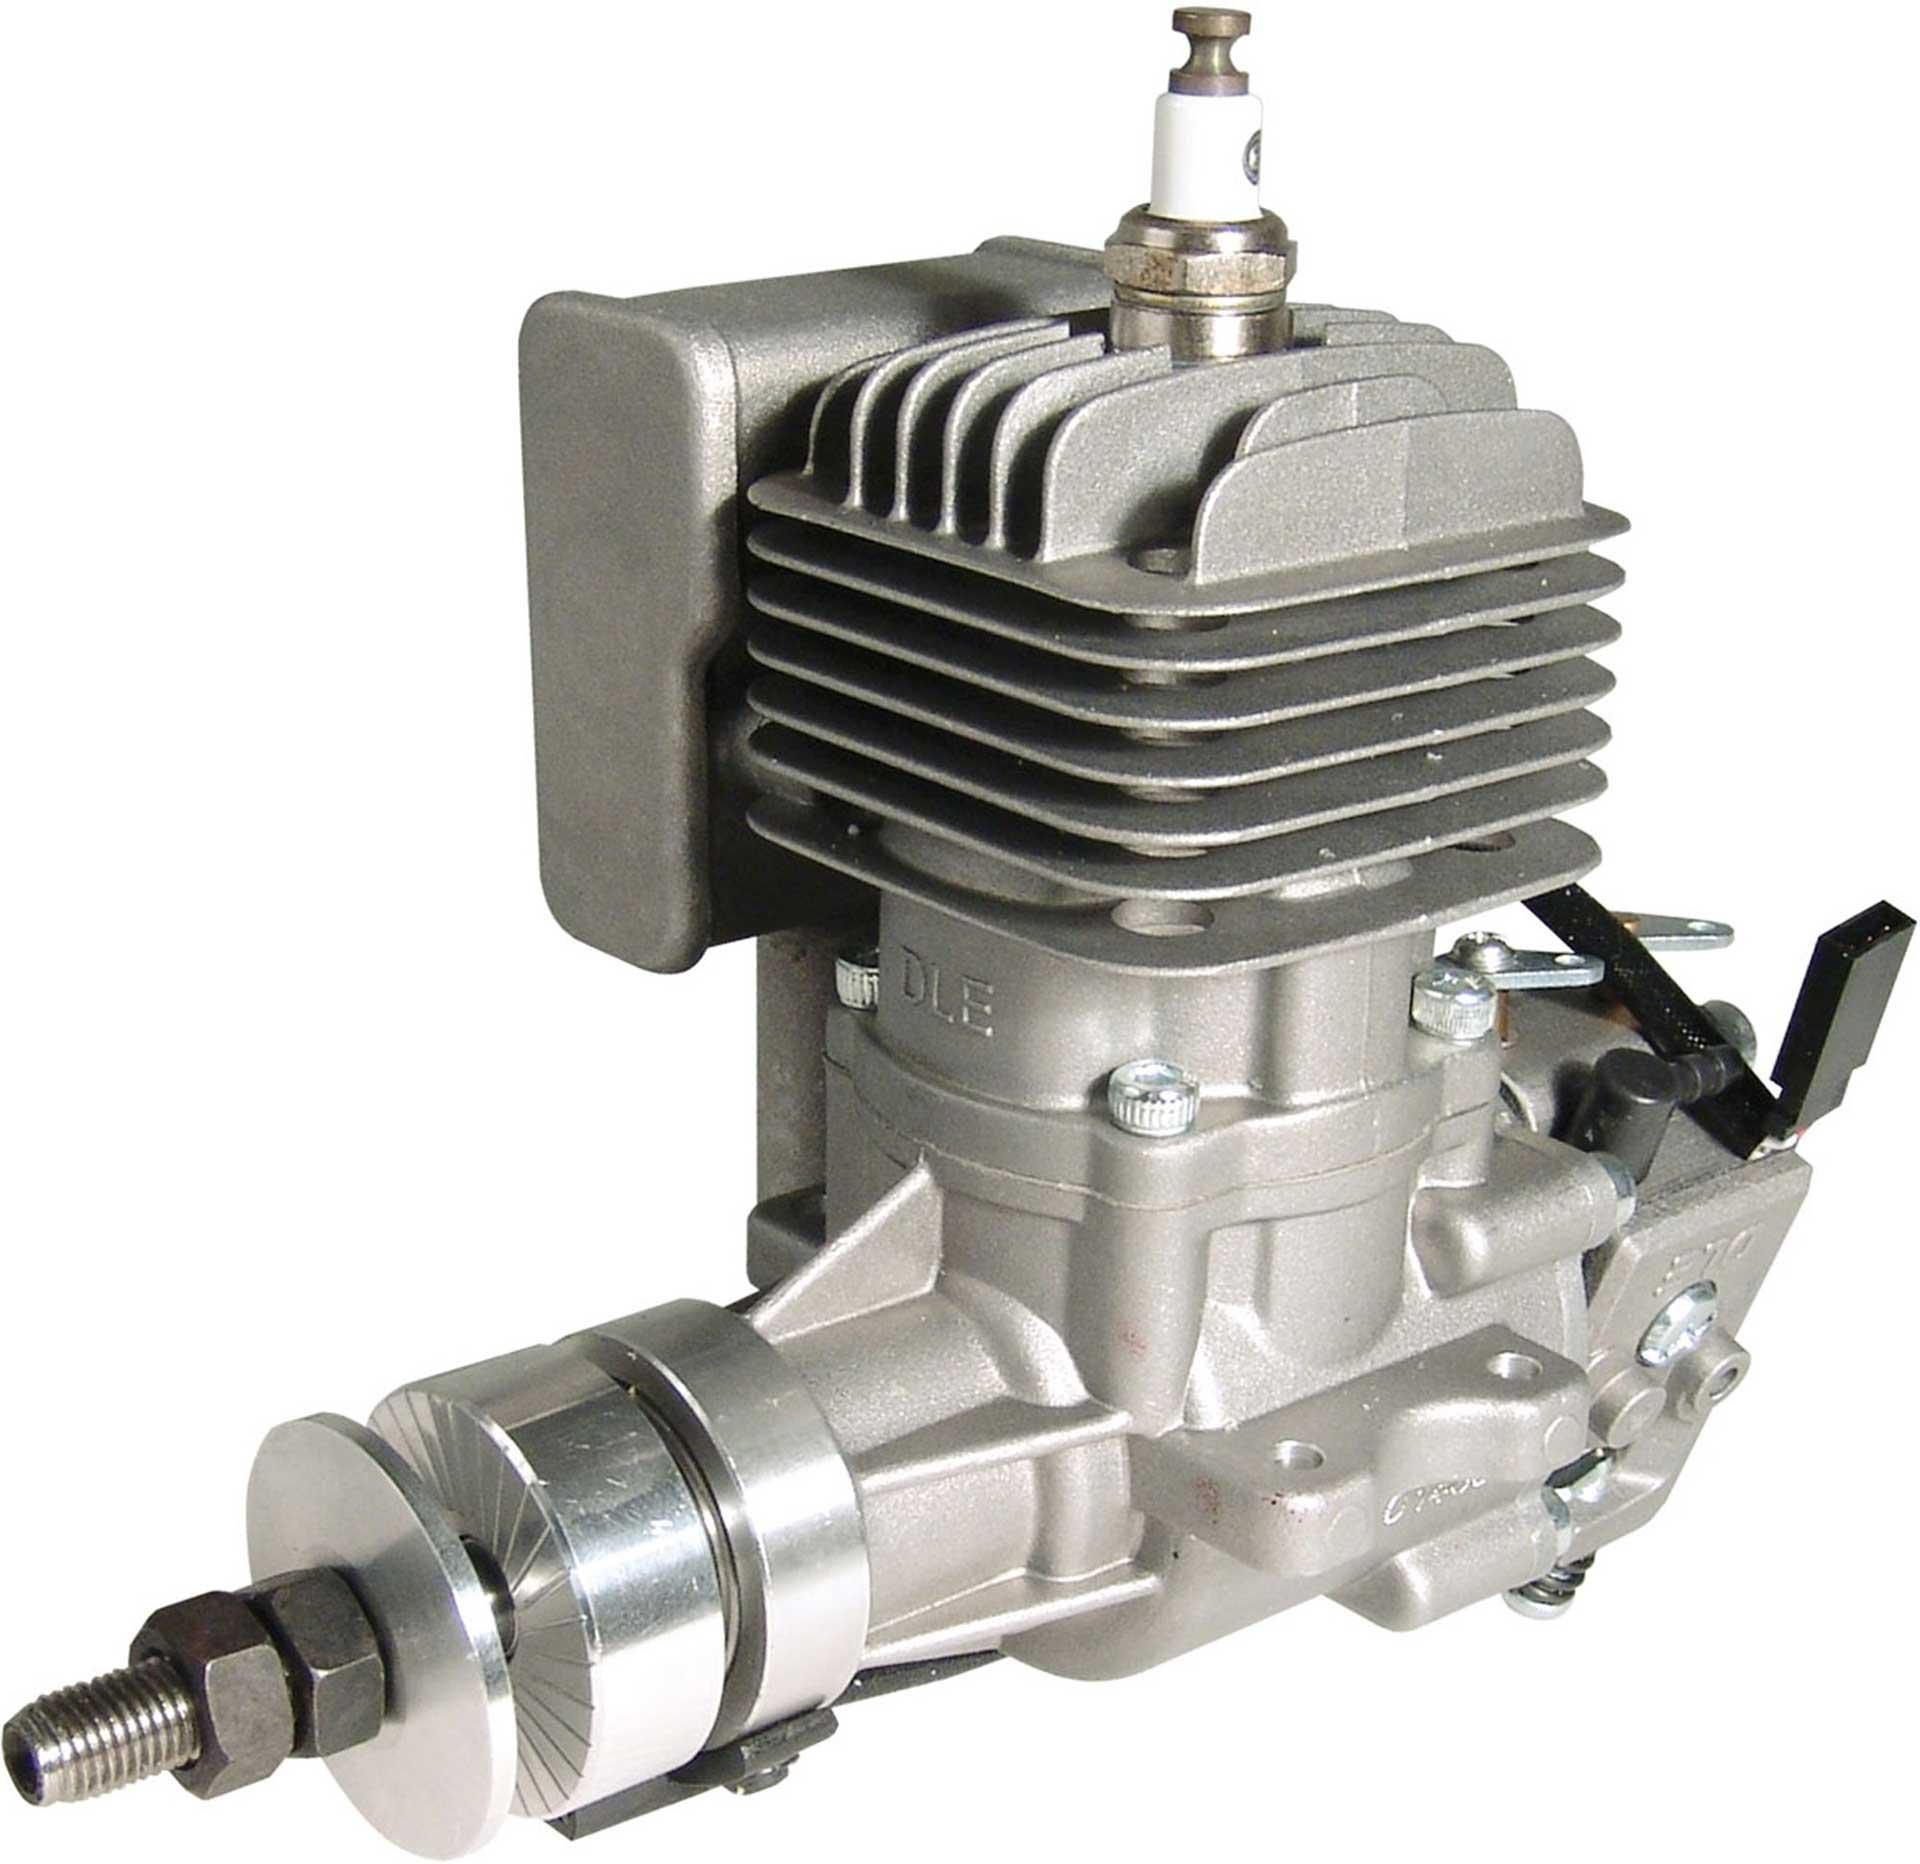 DLE Engines DLE 20 BENZIN MOTOR SEITENAUSLASS